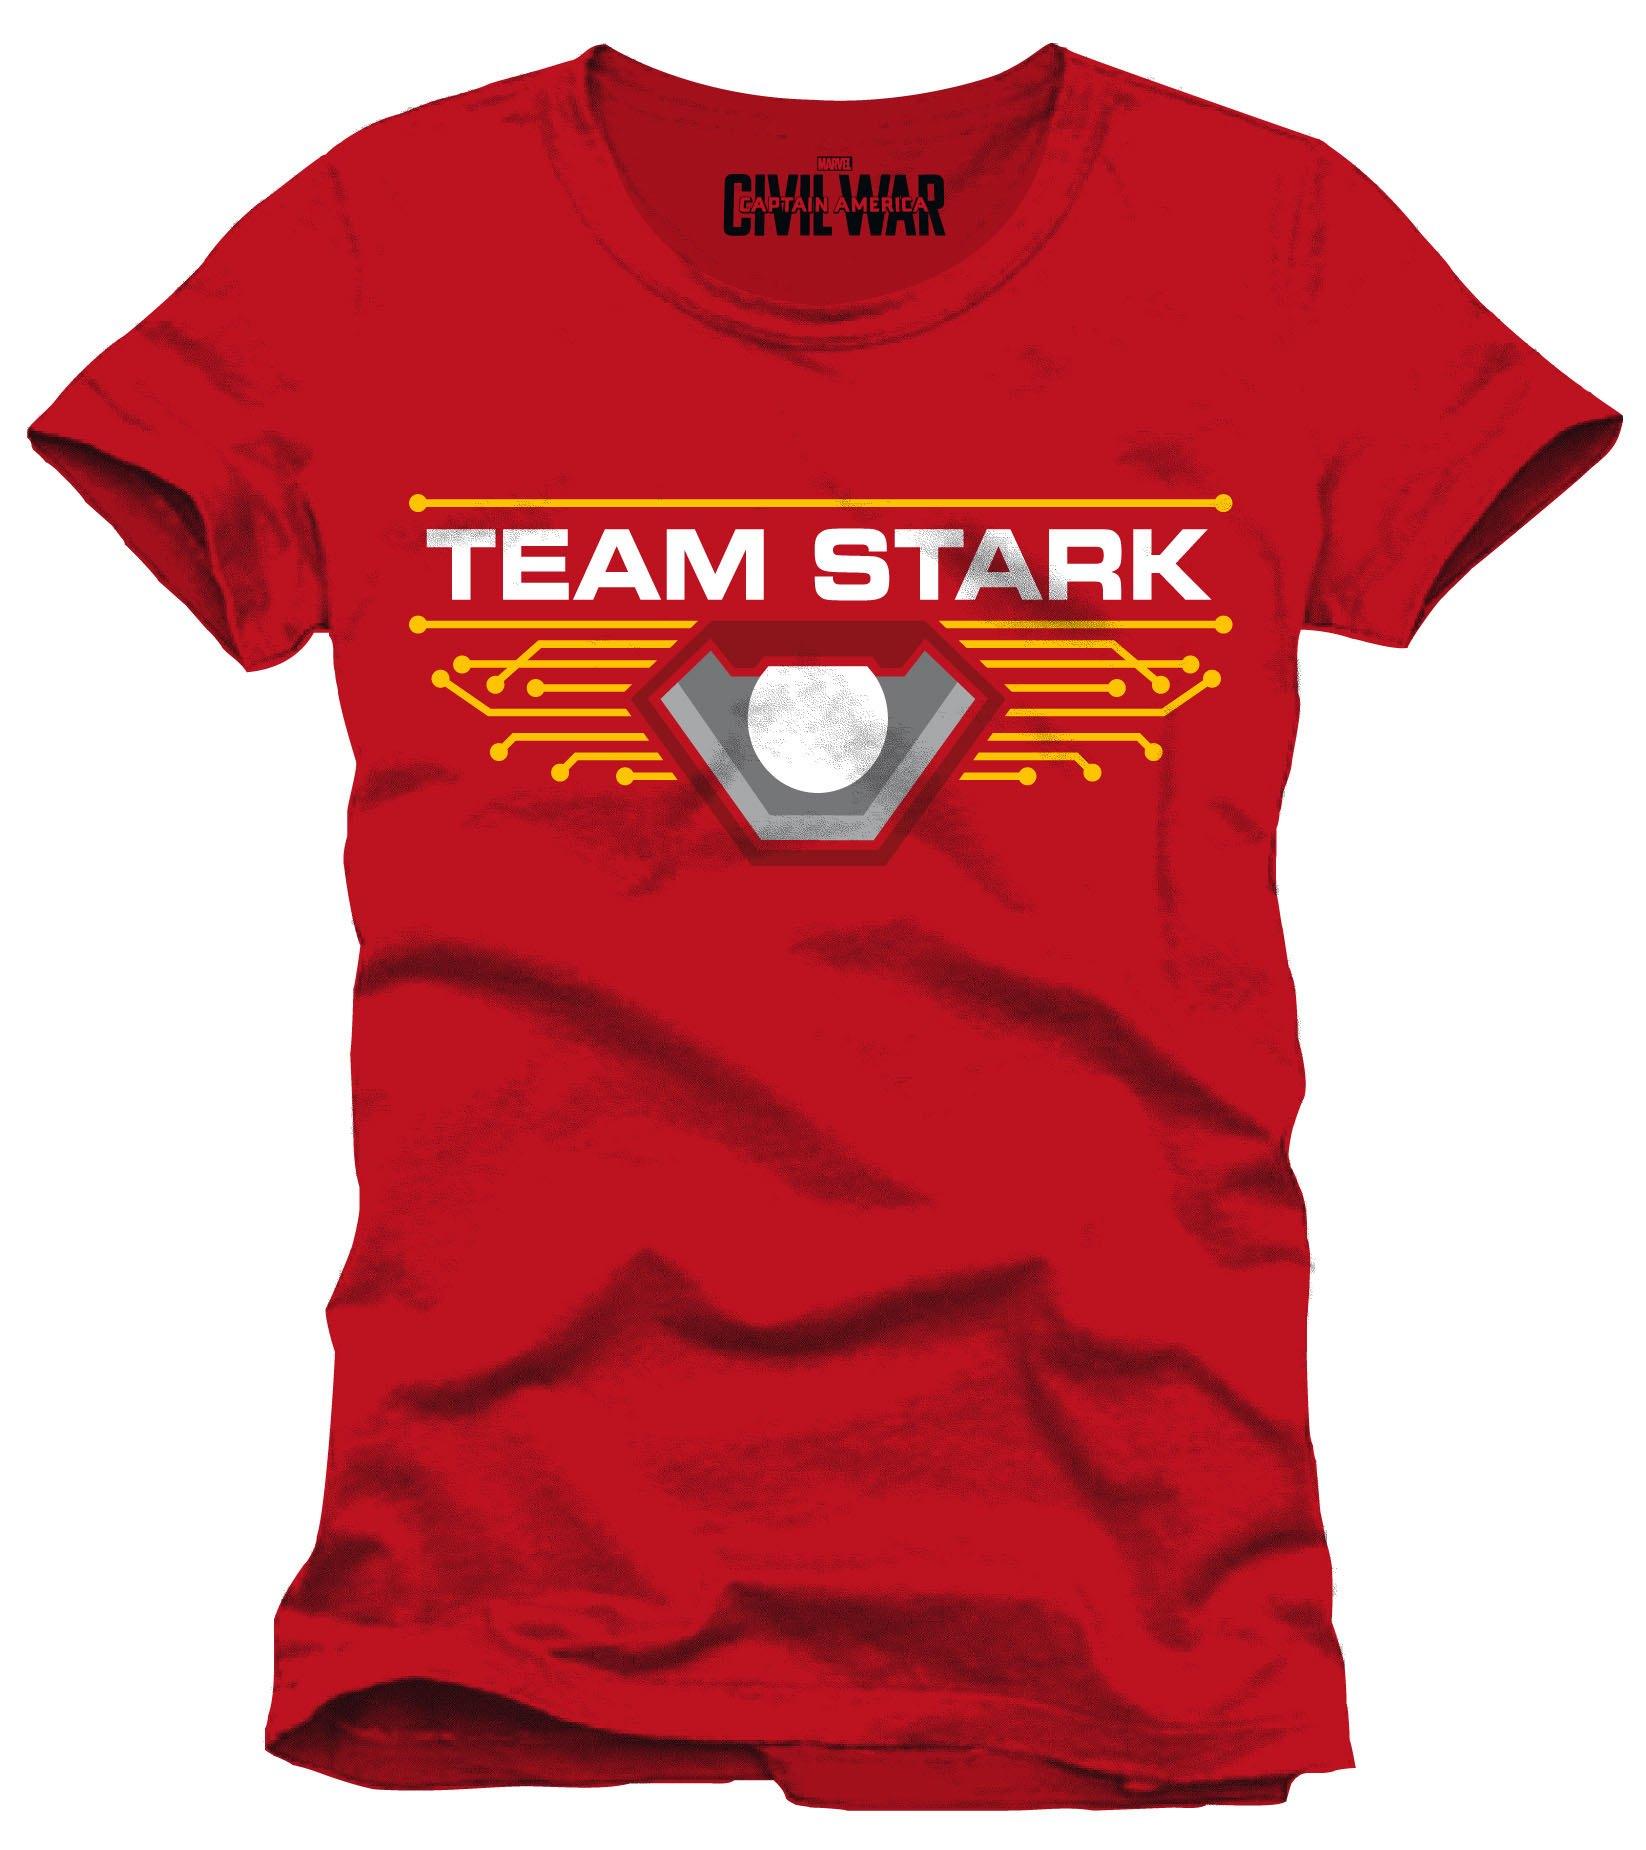 Captain America Civil War T-Shirt Team Stark Size XL